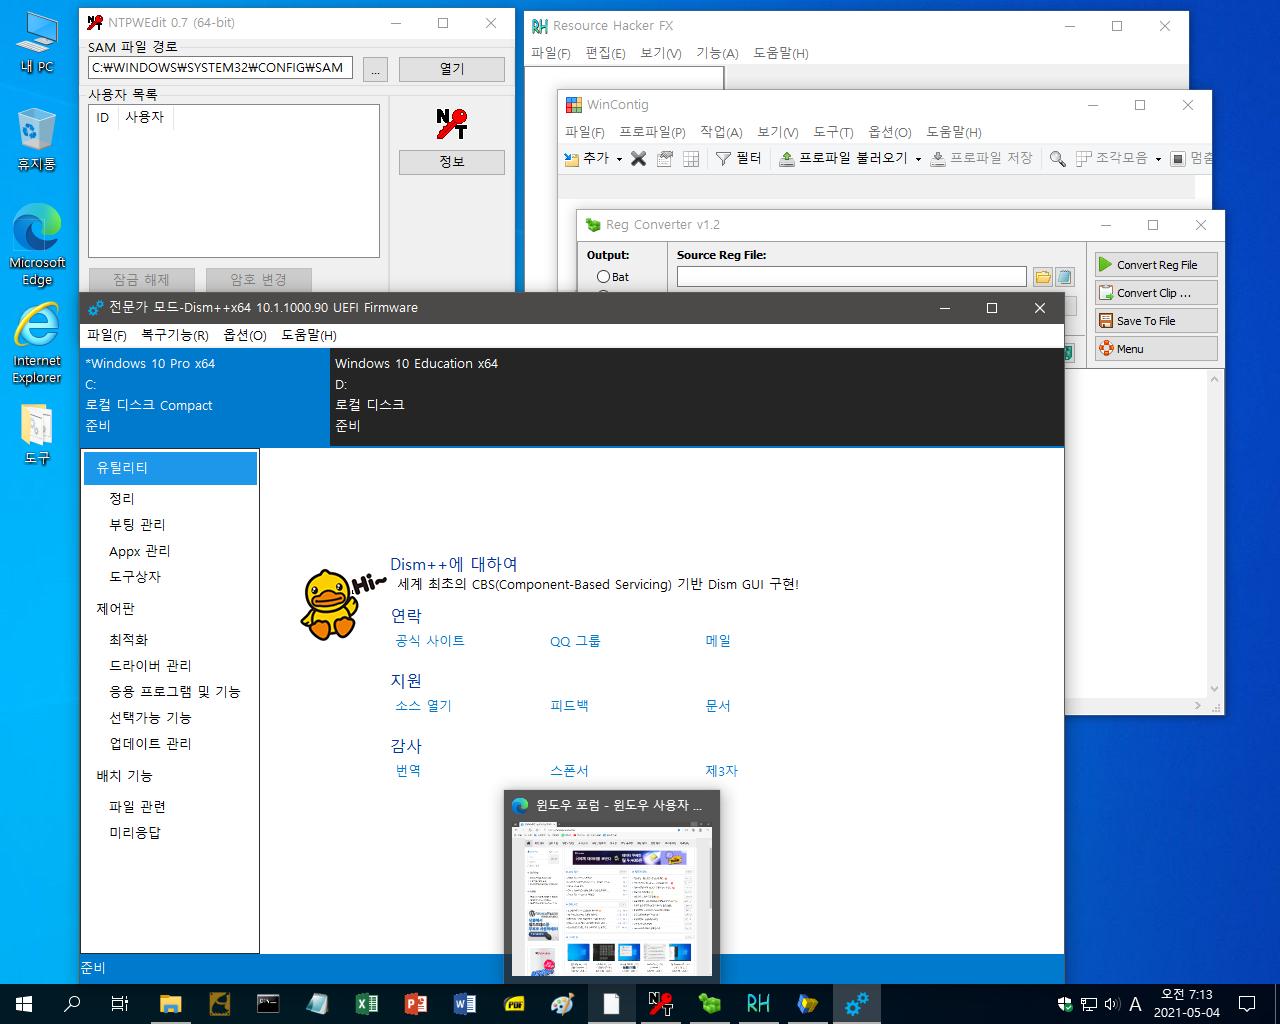 NTPWEdit_Resource_Hacker_Dism++_WinContig_Reg_Converter.png